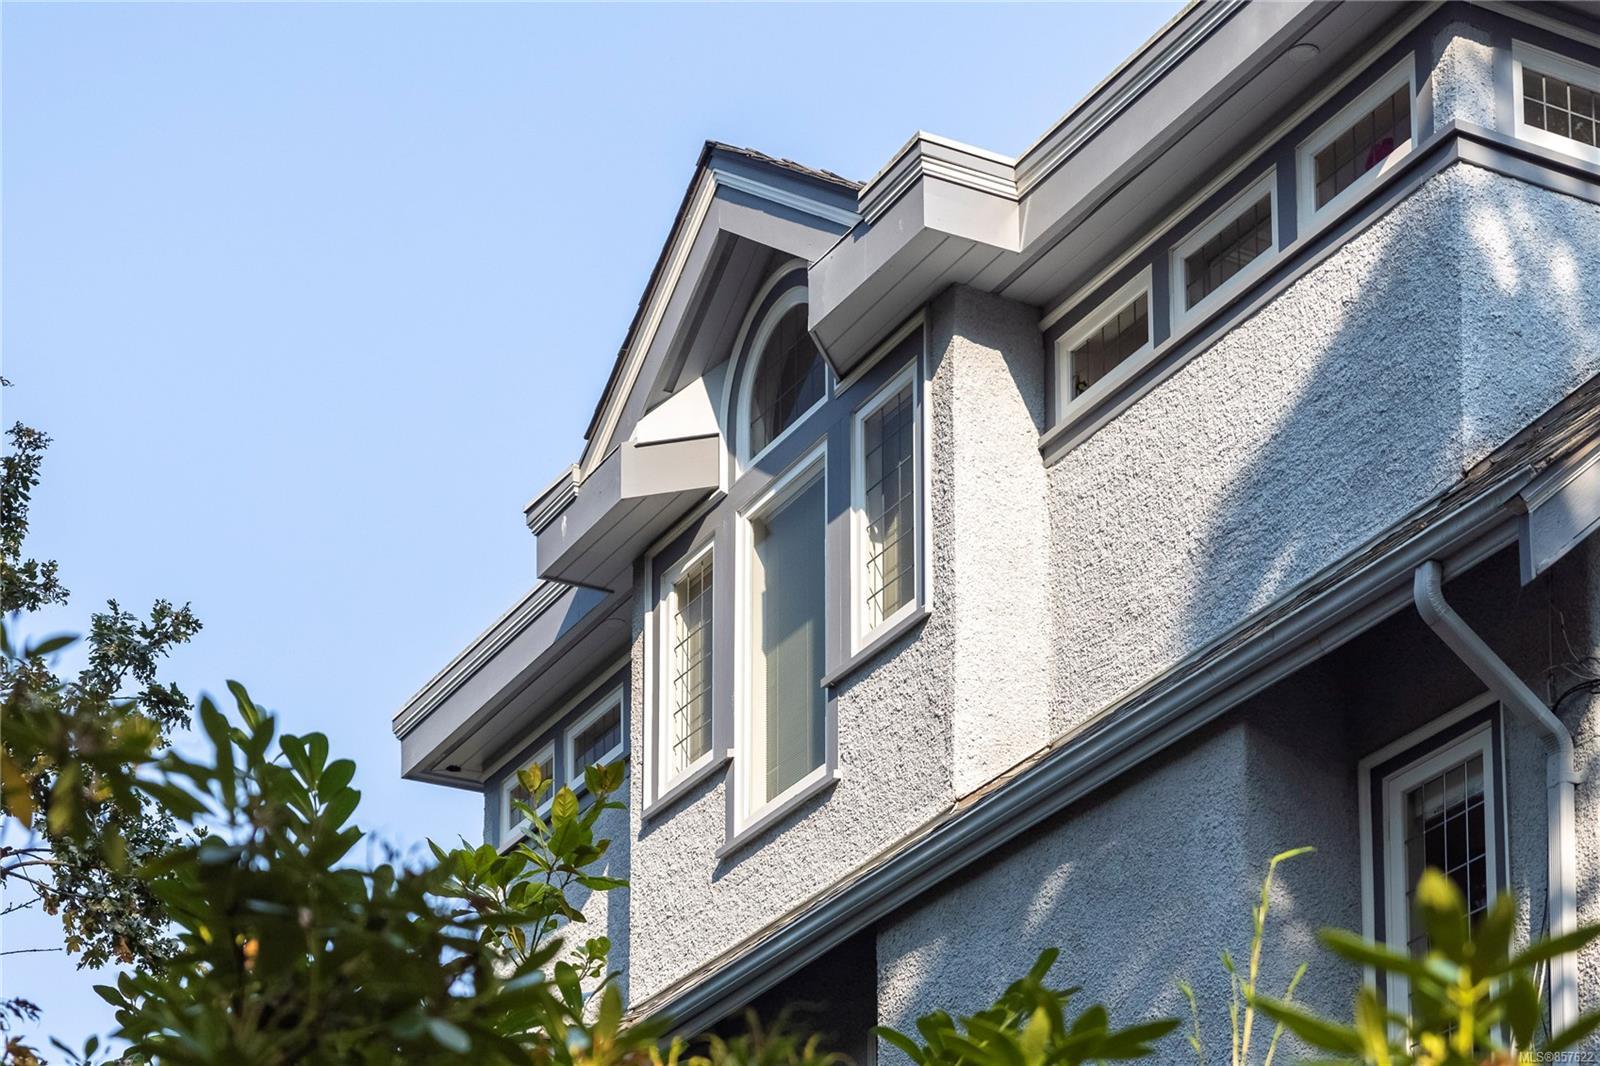 Photo 36 at 935 Terrace Avenue, Rockland, Victoria